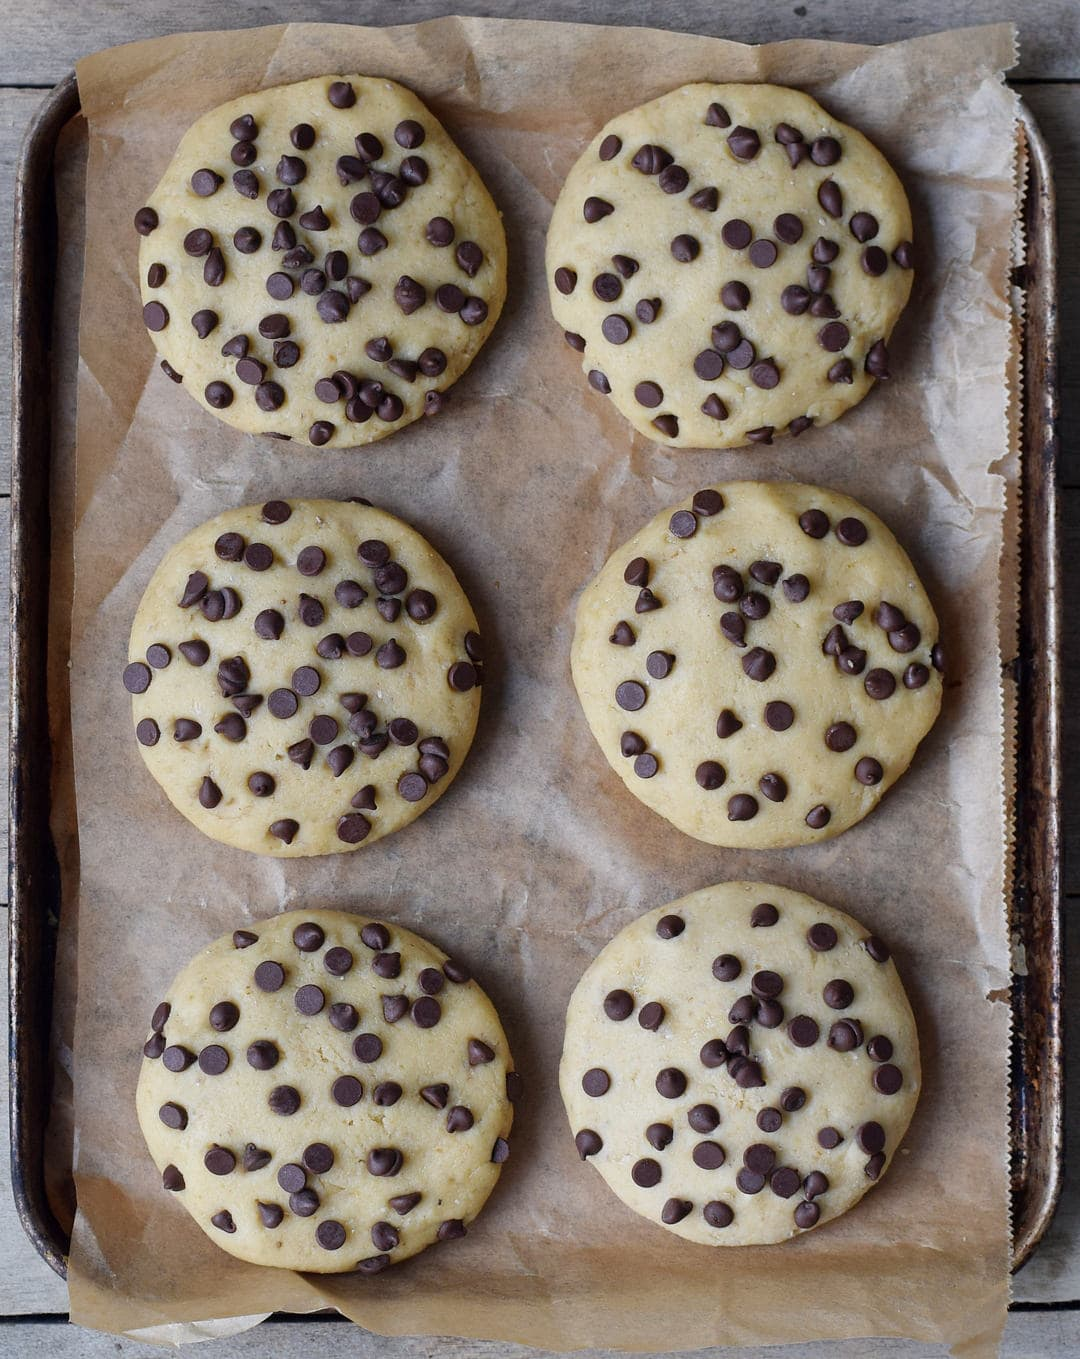 6 ungebackene vegane Kekse mit Schokodrops auf Backblech